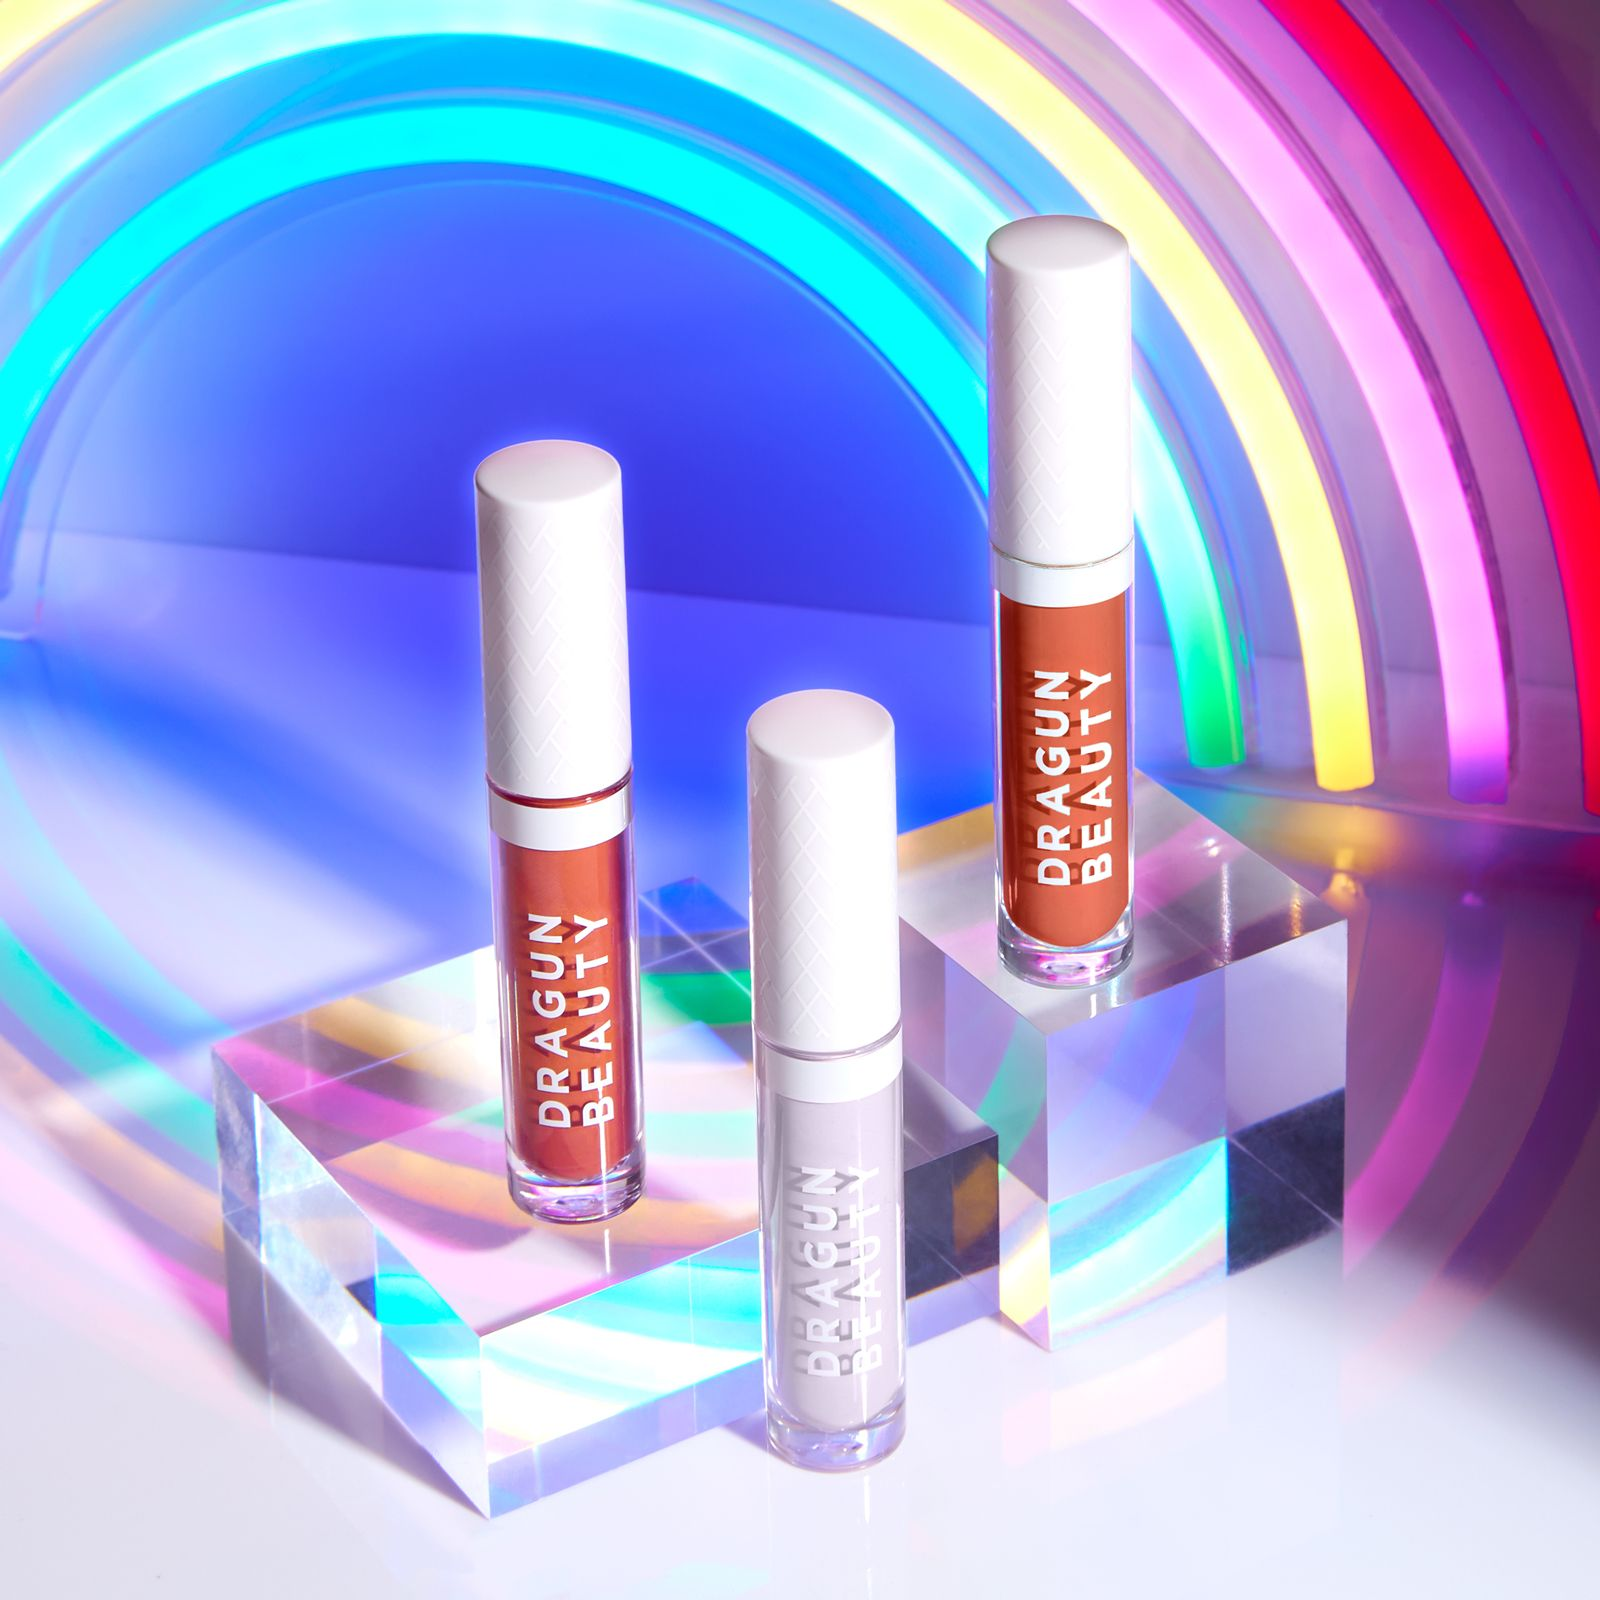 Dragun Beauty DragunFire Color Corrector Product